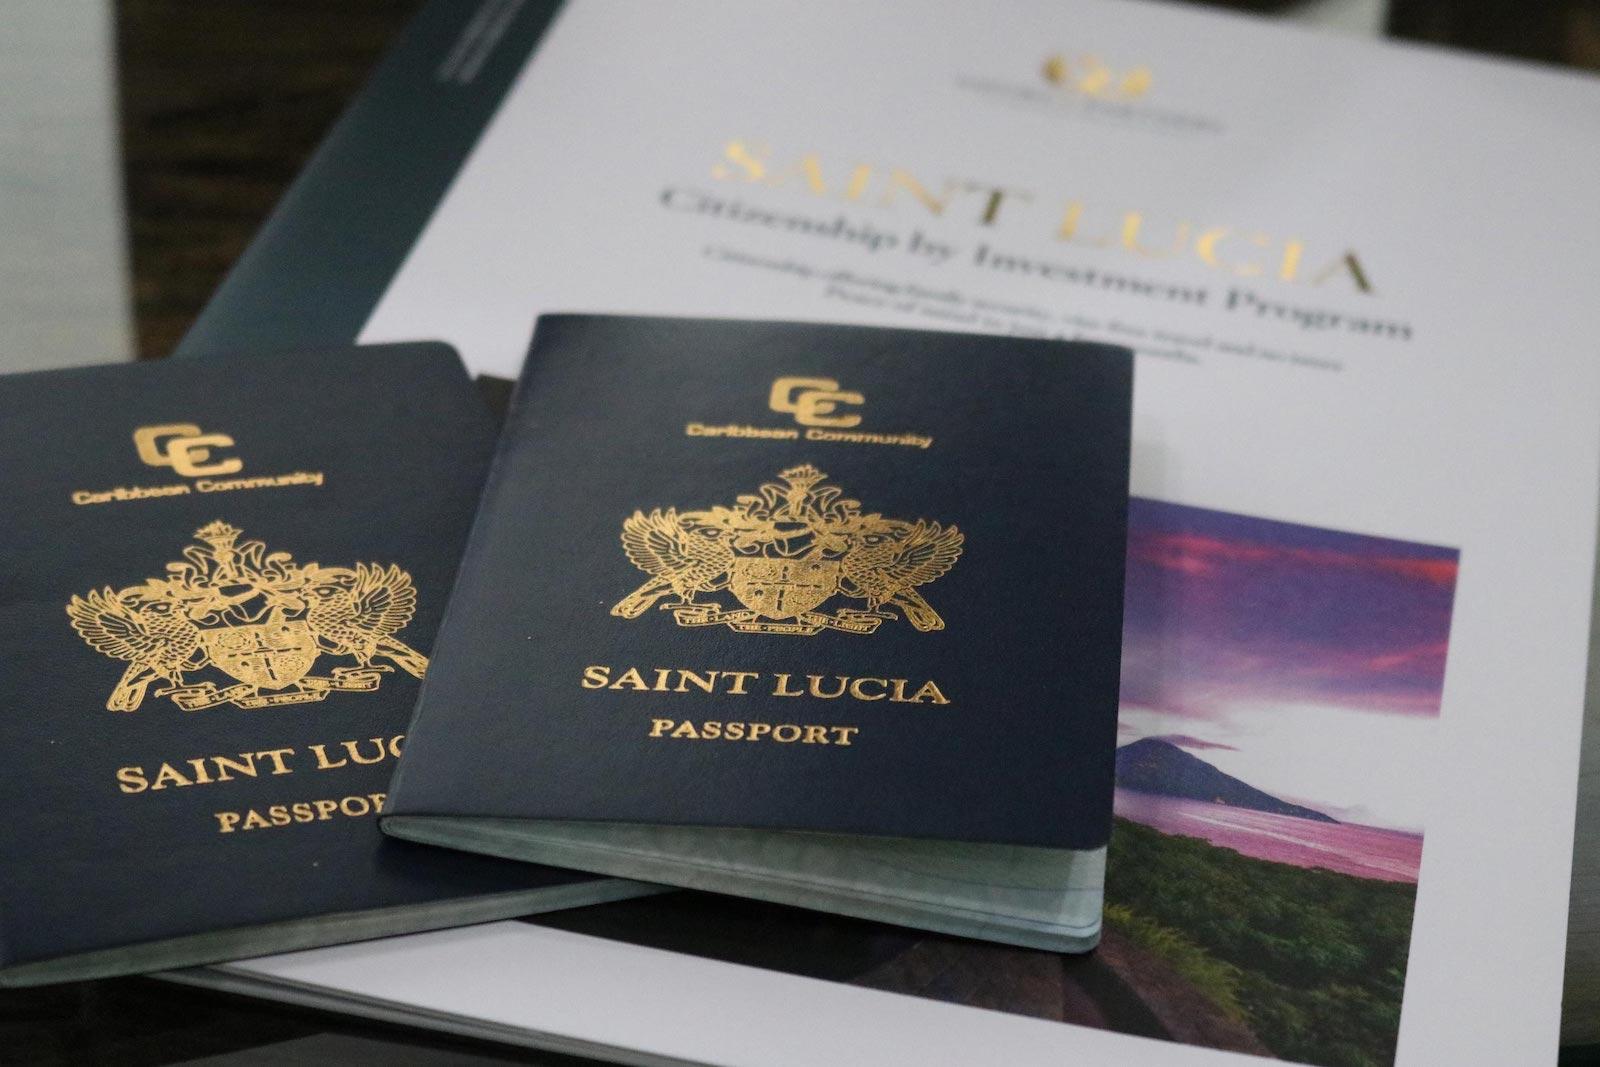 Saint Lucia Photos Second Passport St Lucia Savory